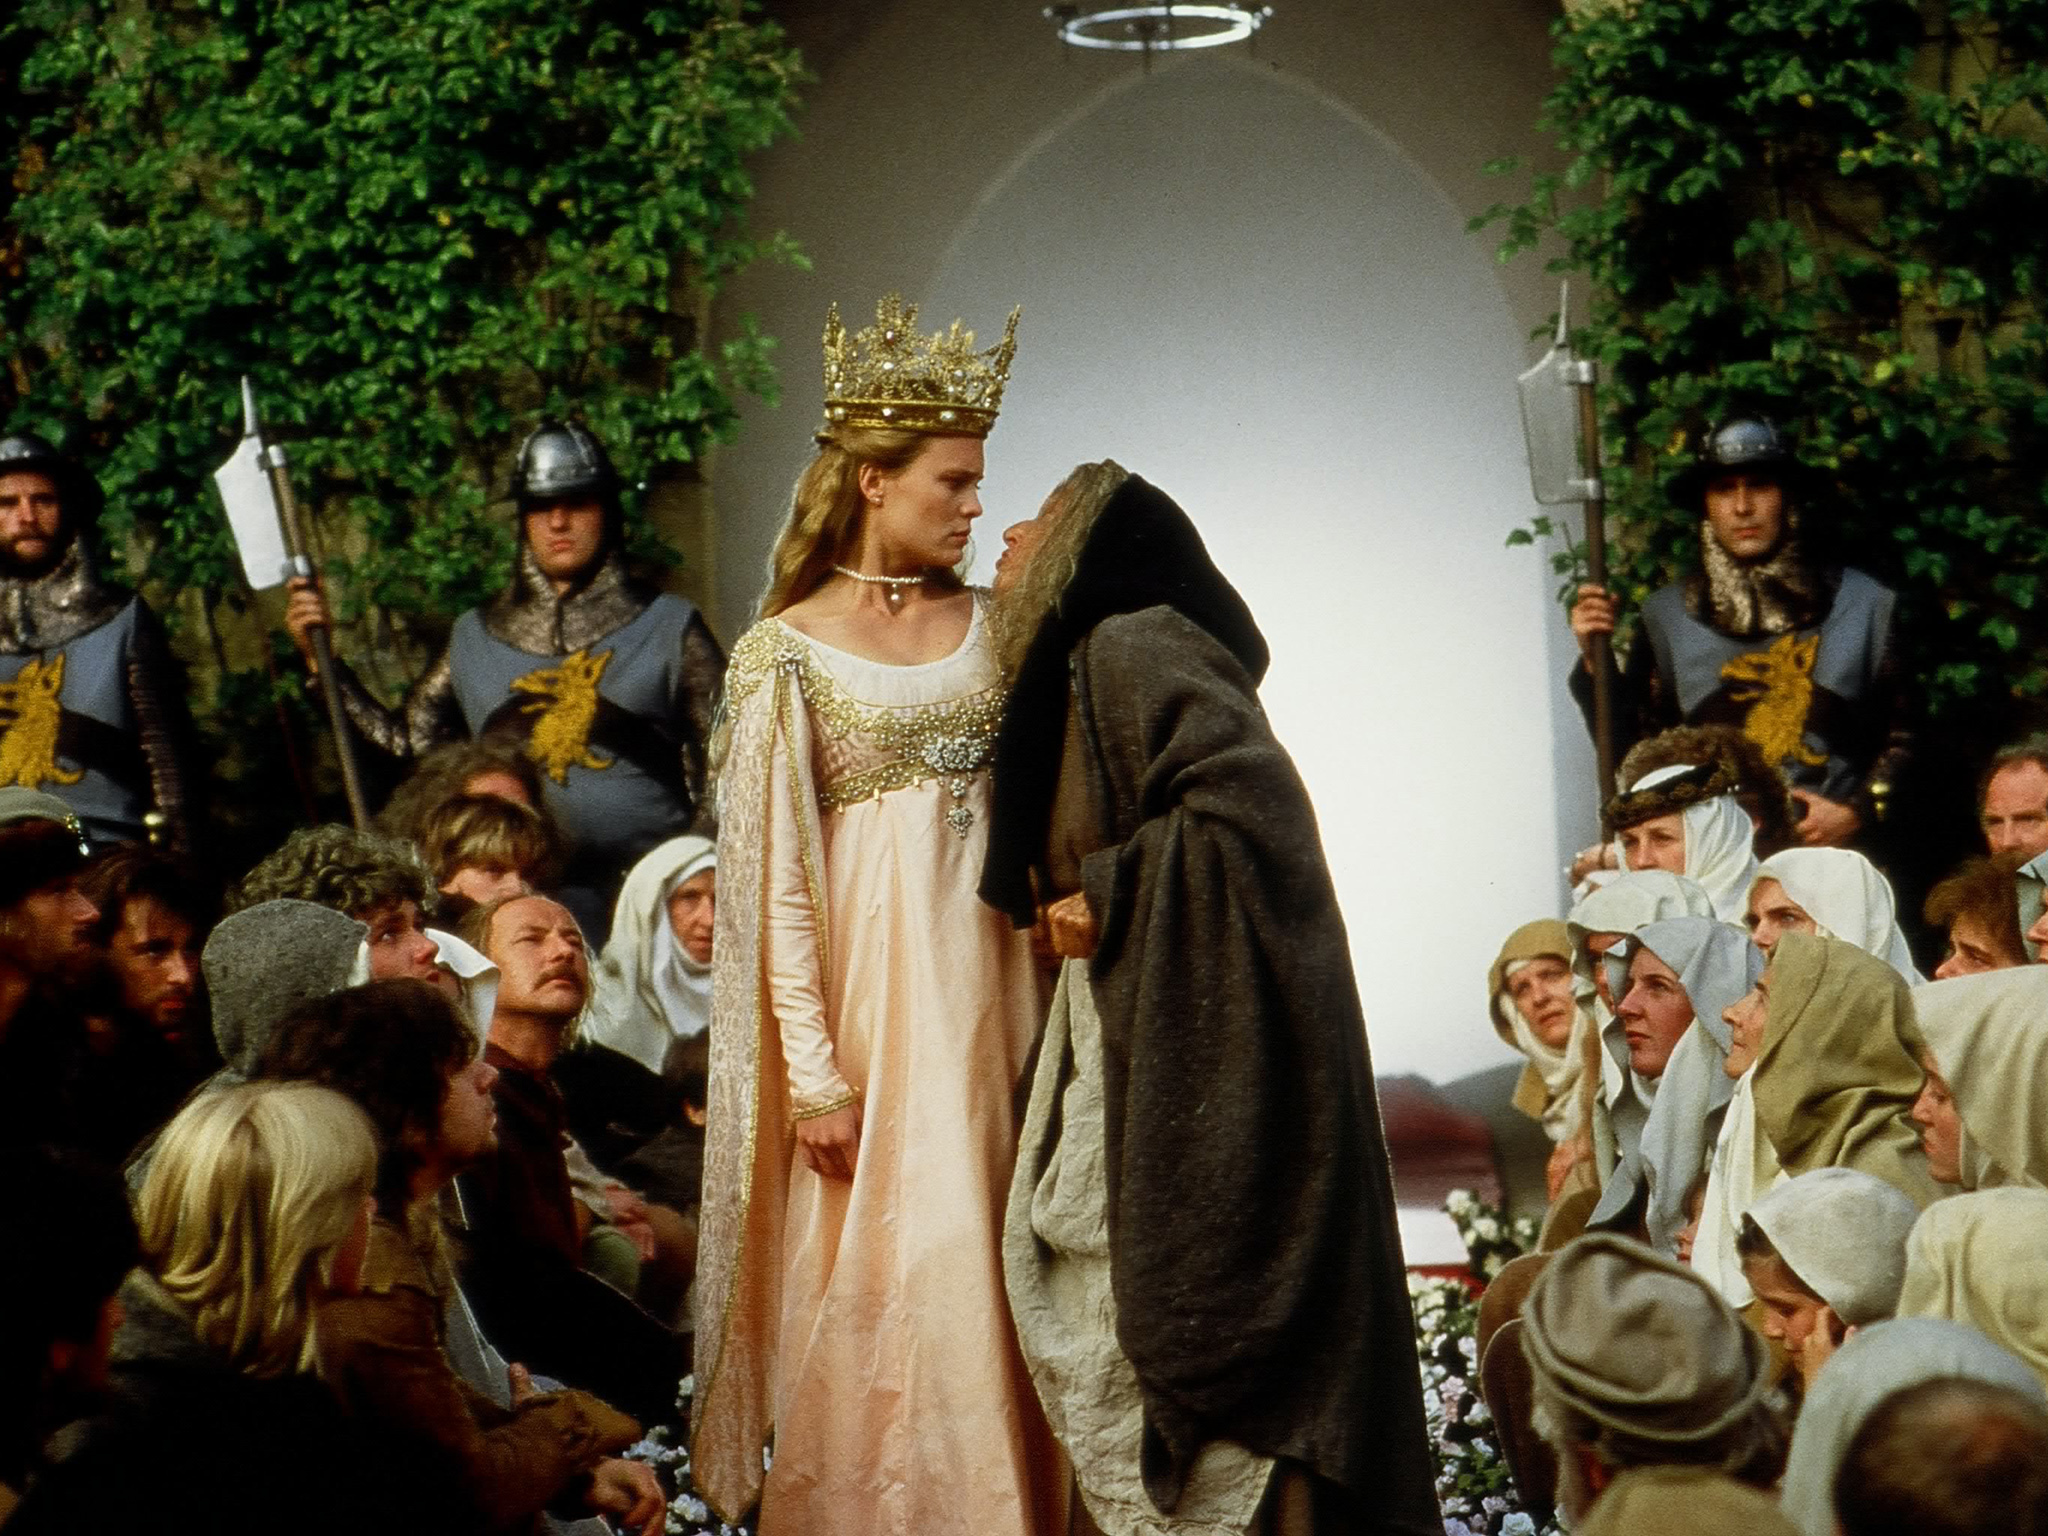 The Princess Bride An Erotic Template - Random Photo Gallery-8900